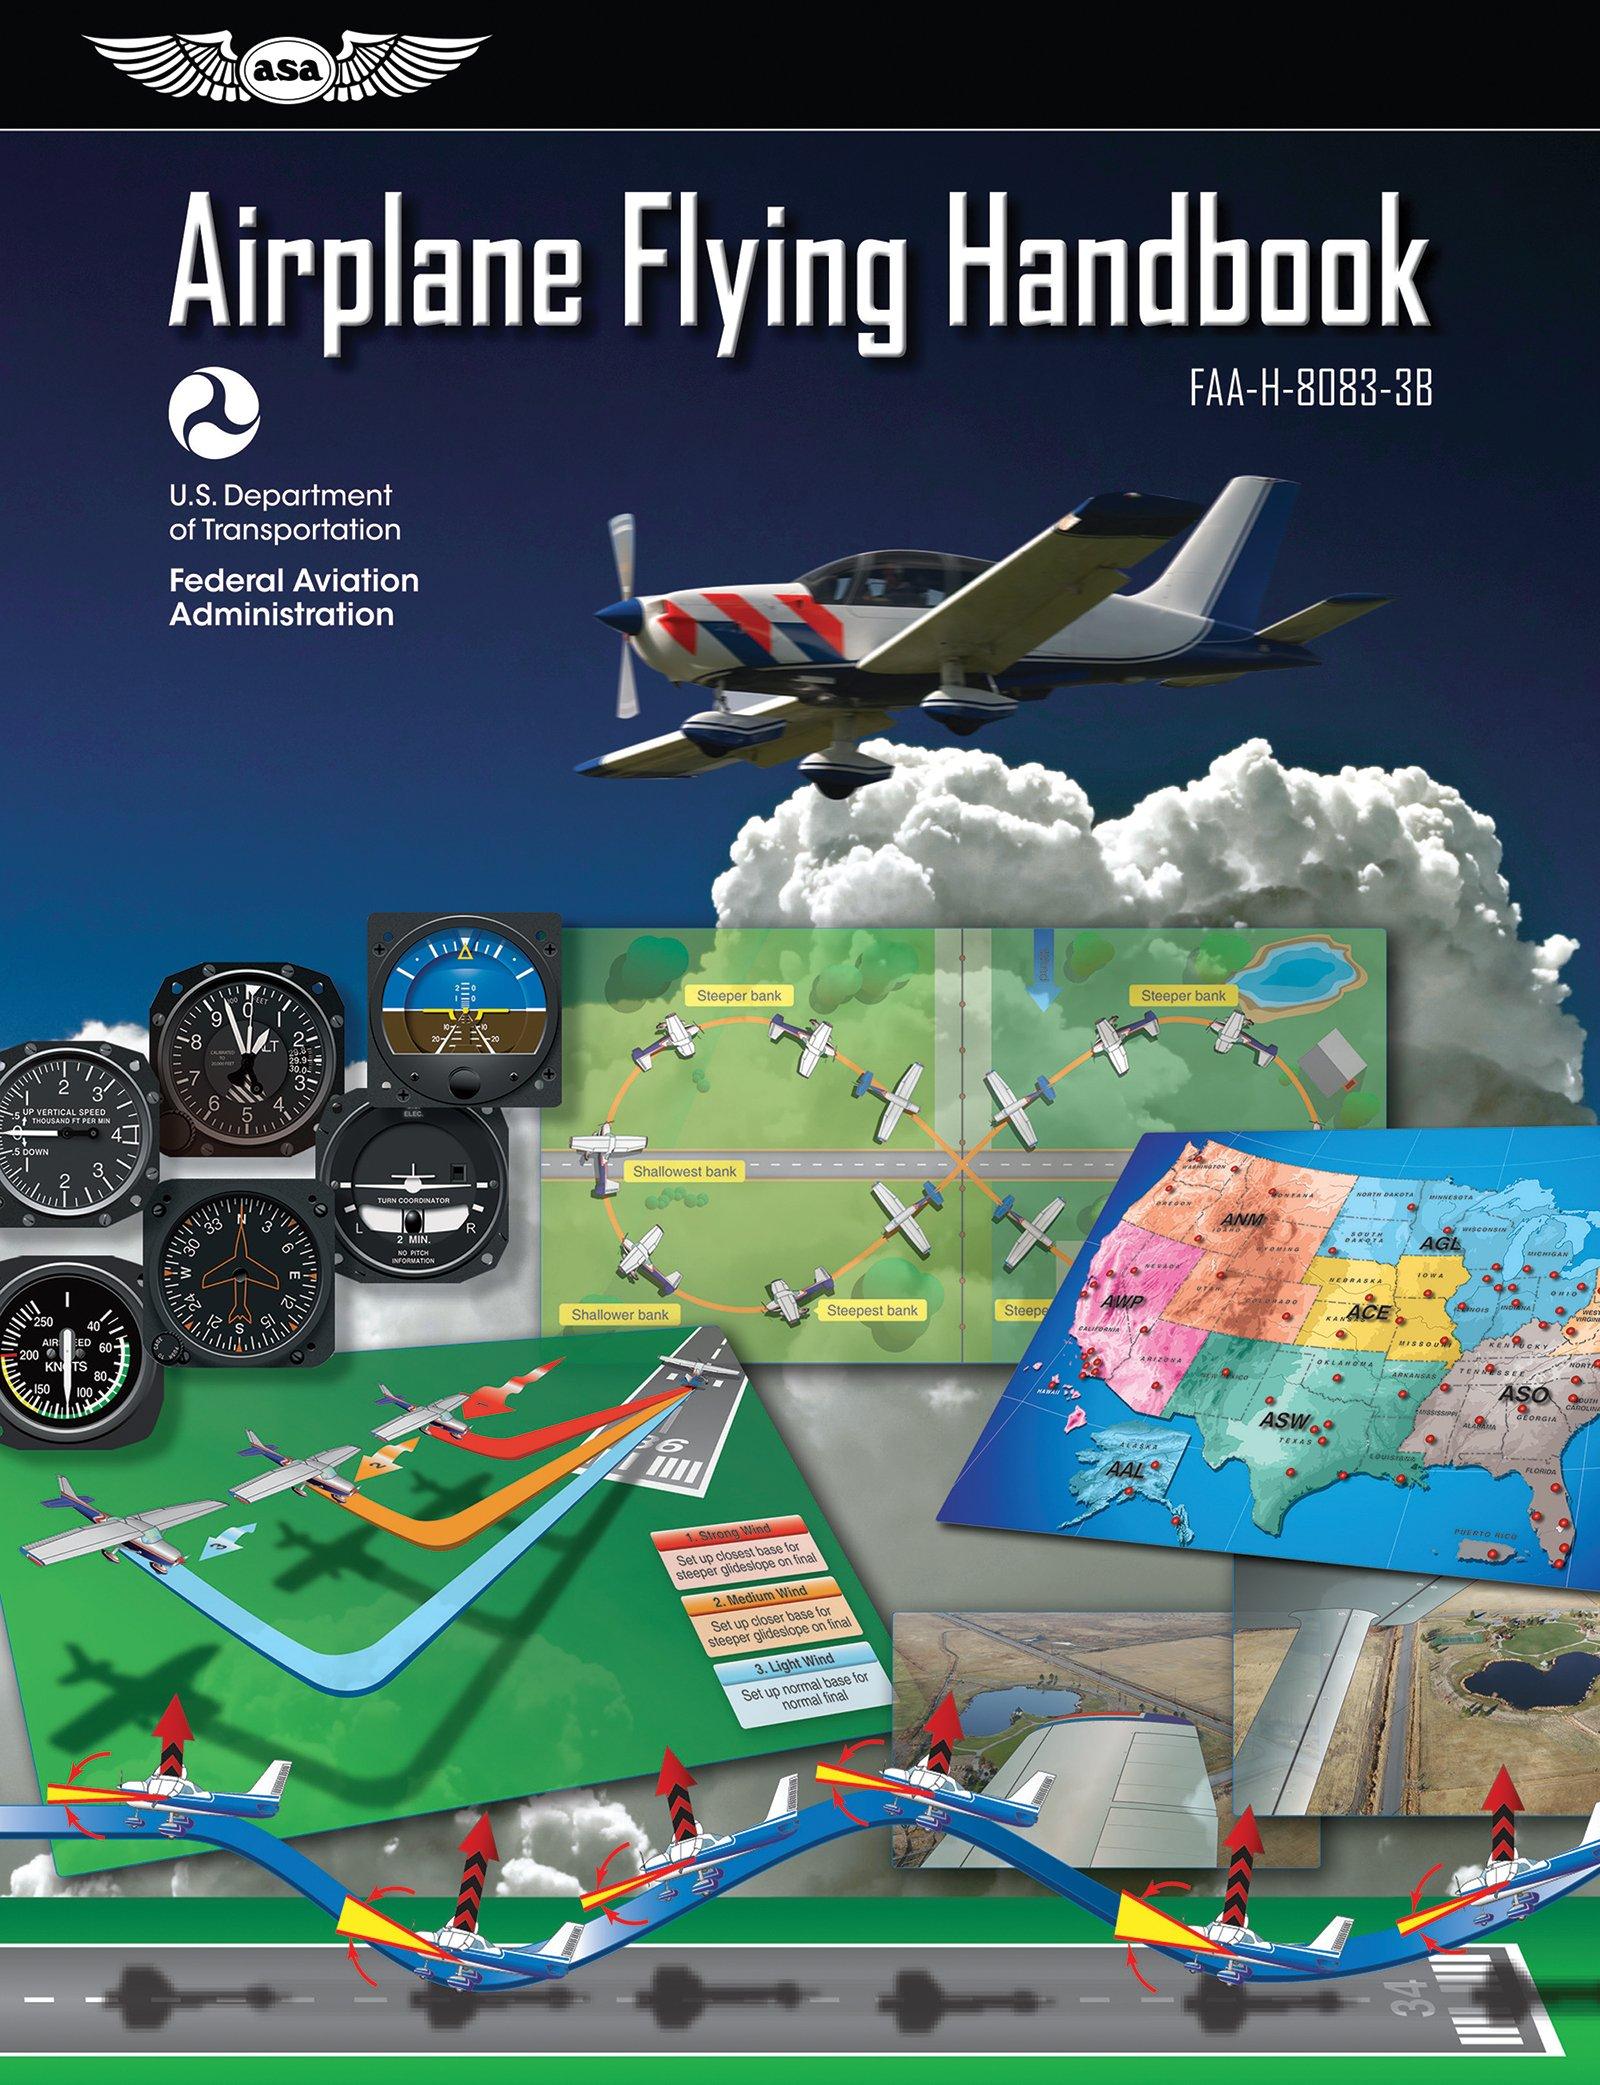 Airplane Flying Handbook: ASA FAA-H-8083-3B: Federal Aviation  Administration (FAA): 9781619545120: Amazon.com: Books